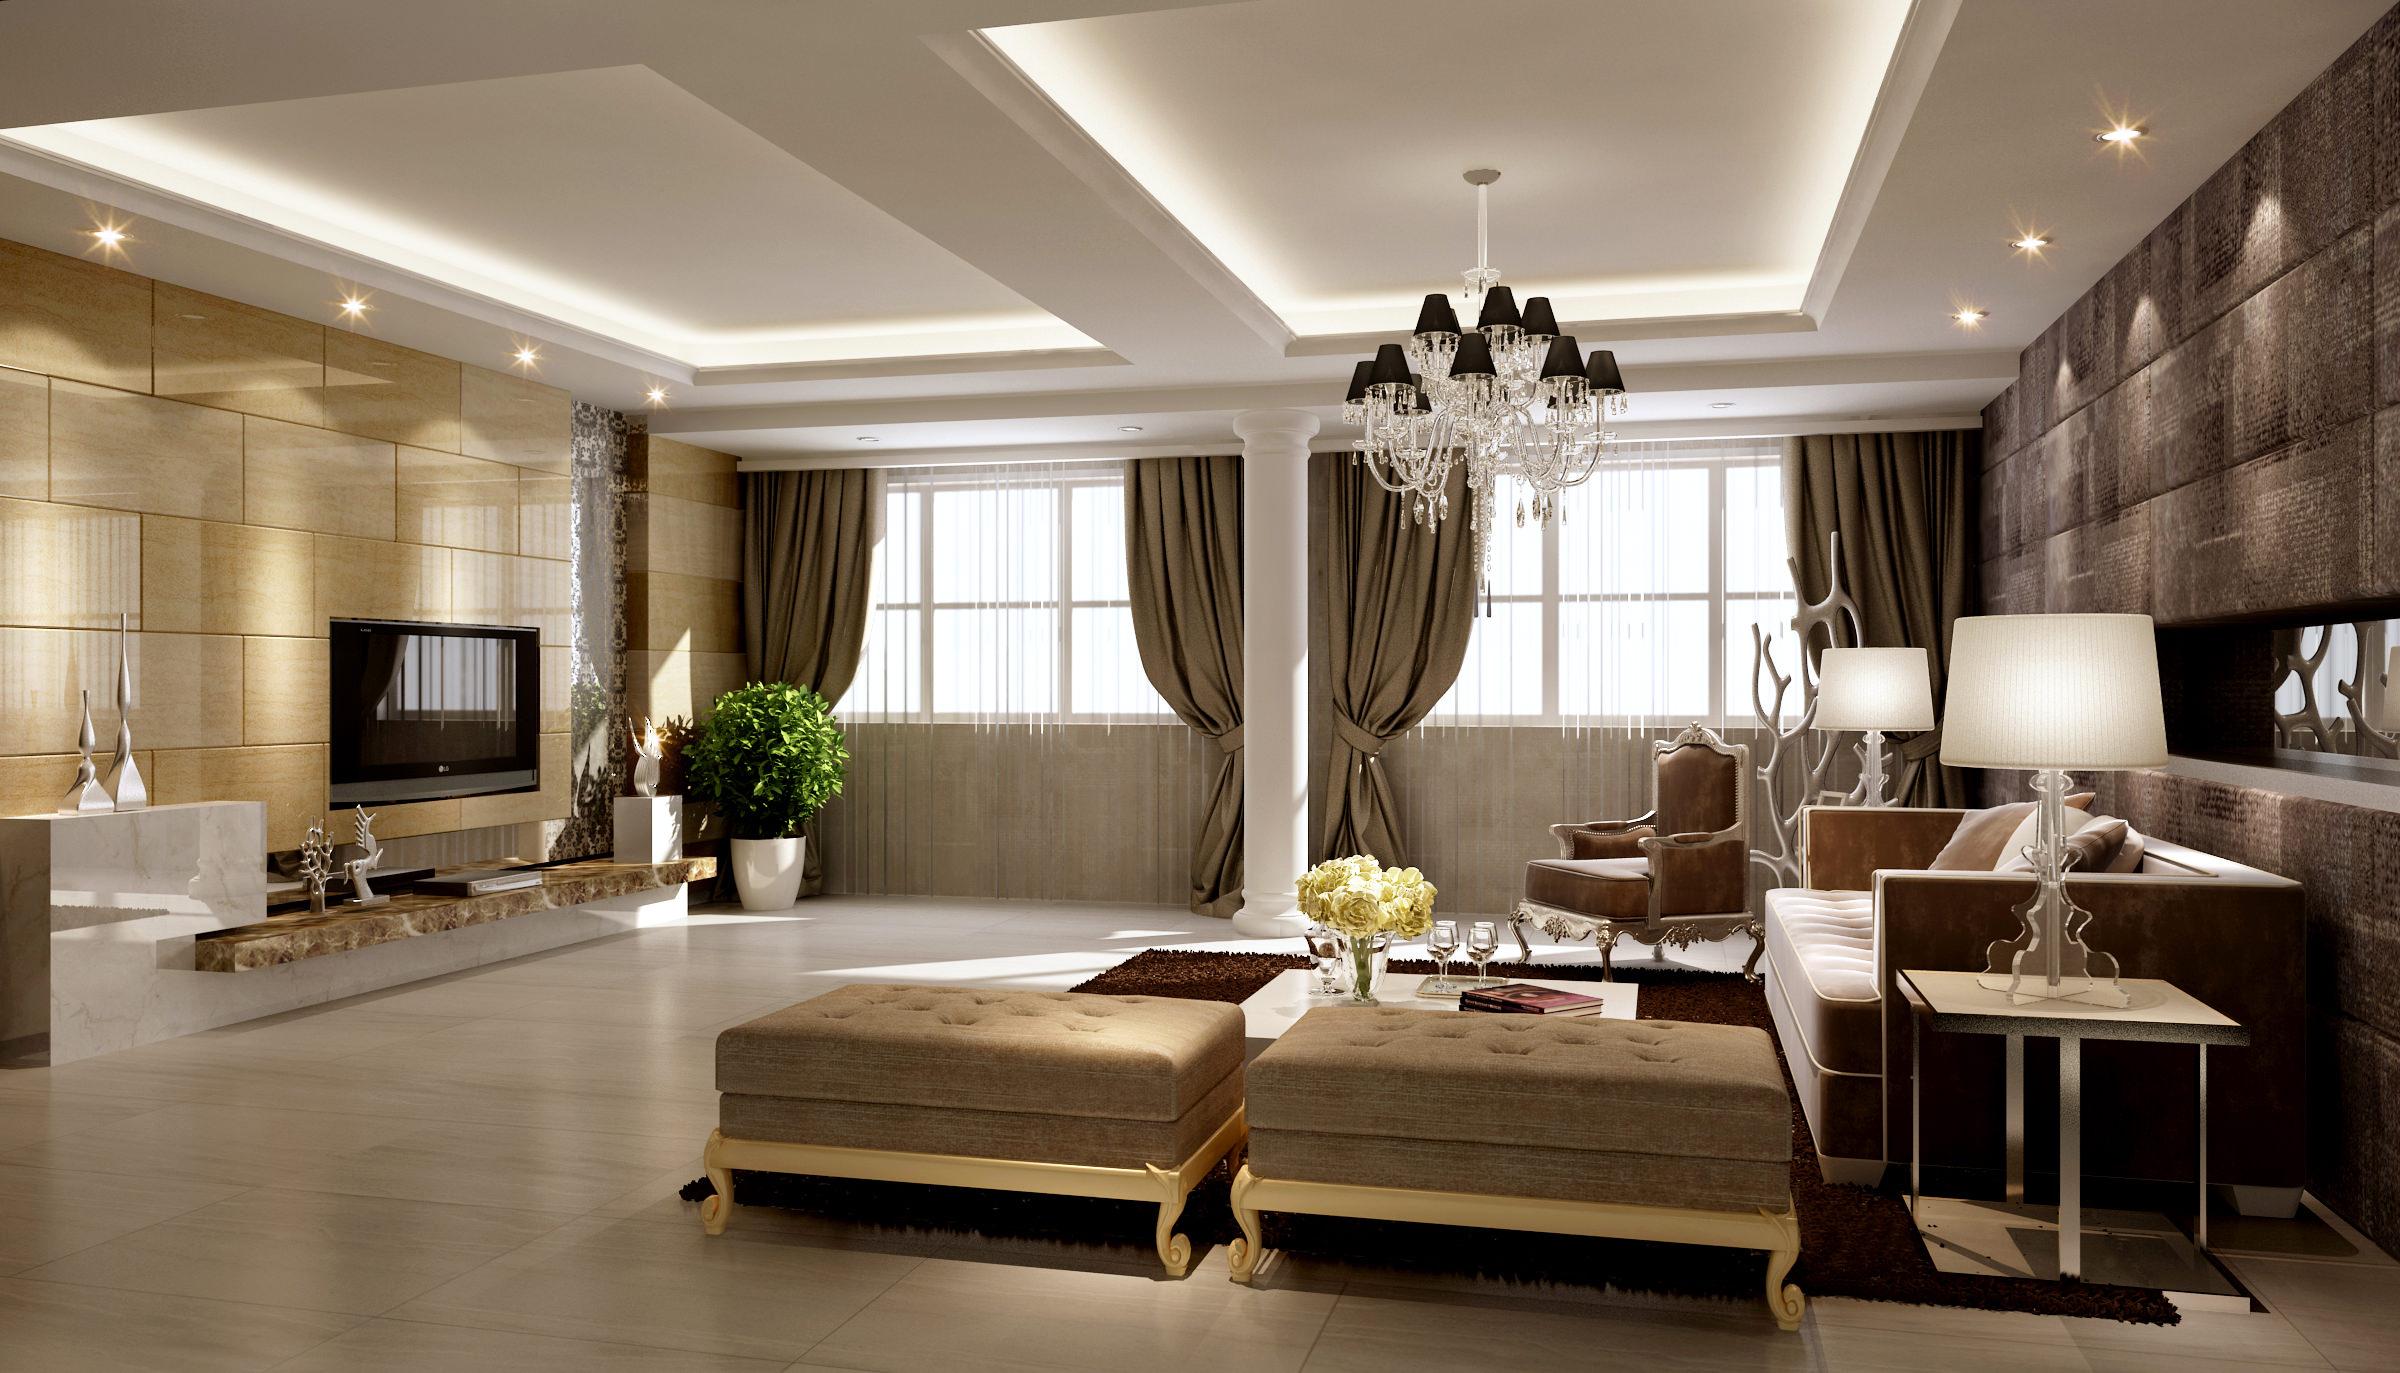 Breathtaking Modern Interior Of A Bedroom Room 3D Gallery - Simple ...